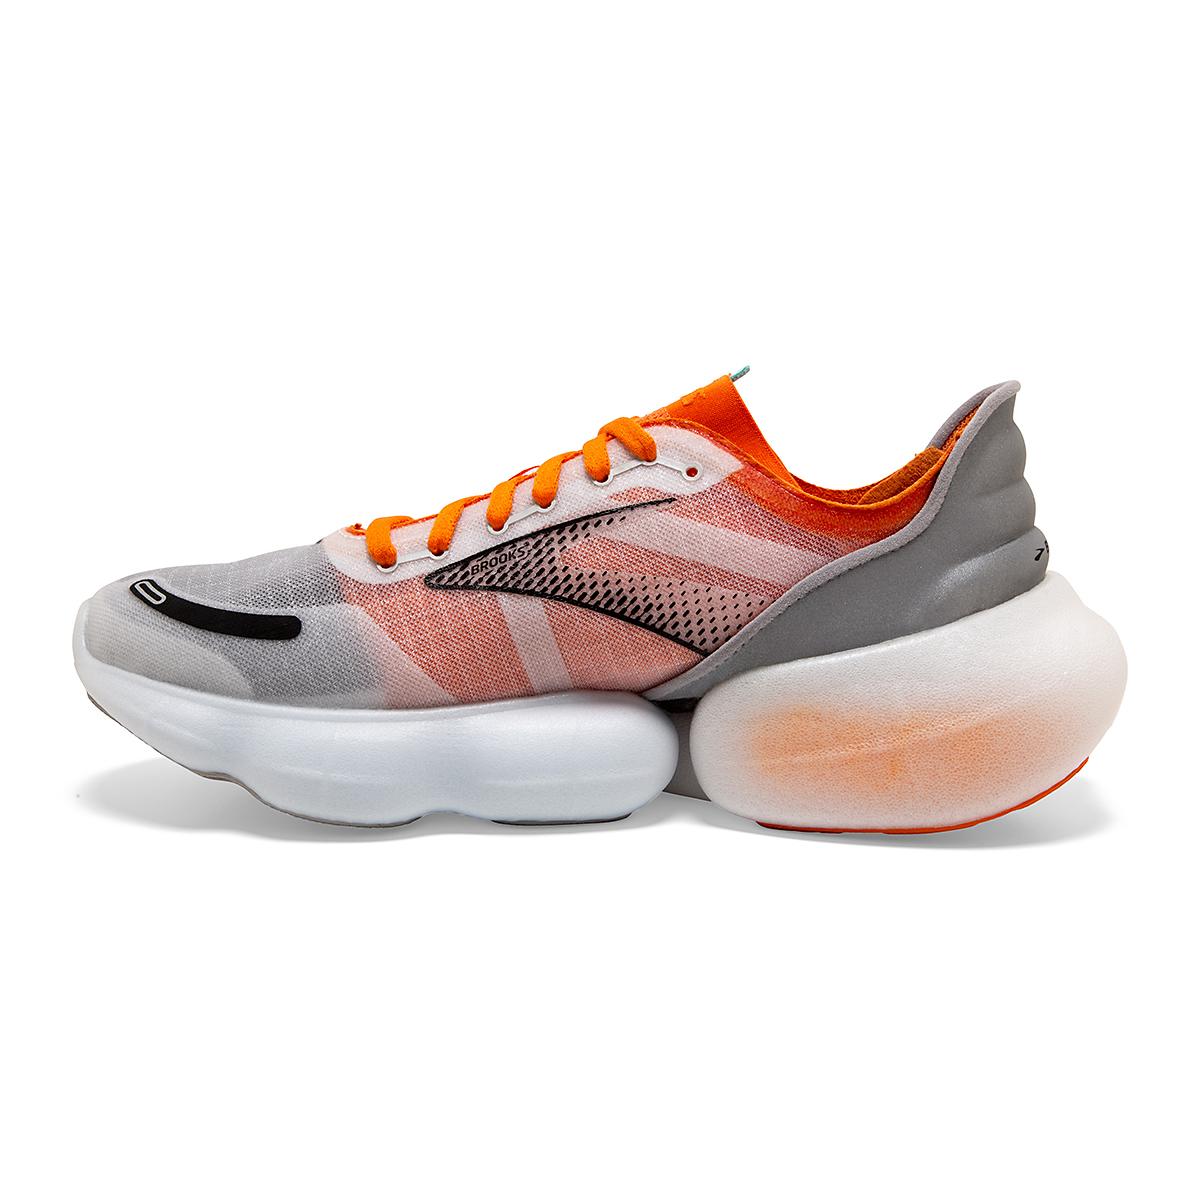 Men's Brooks Aurora-BL Running Shoe - Color: Persimmon/Antarctica - Size: 7 - Width: Regular, Persimmon/Antarctica, large, image 2